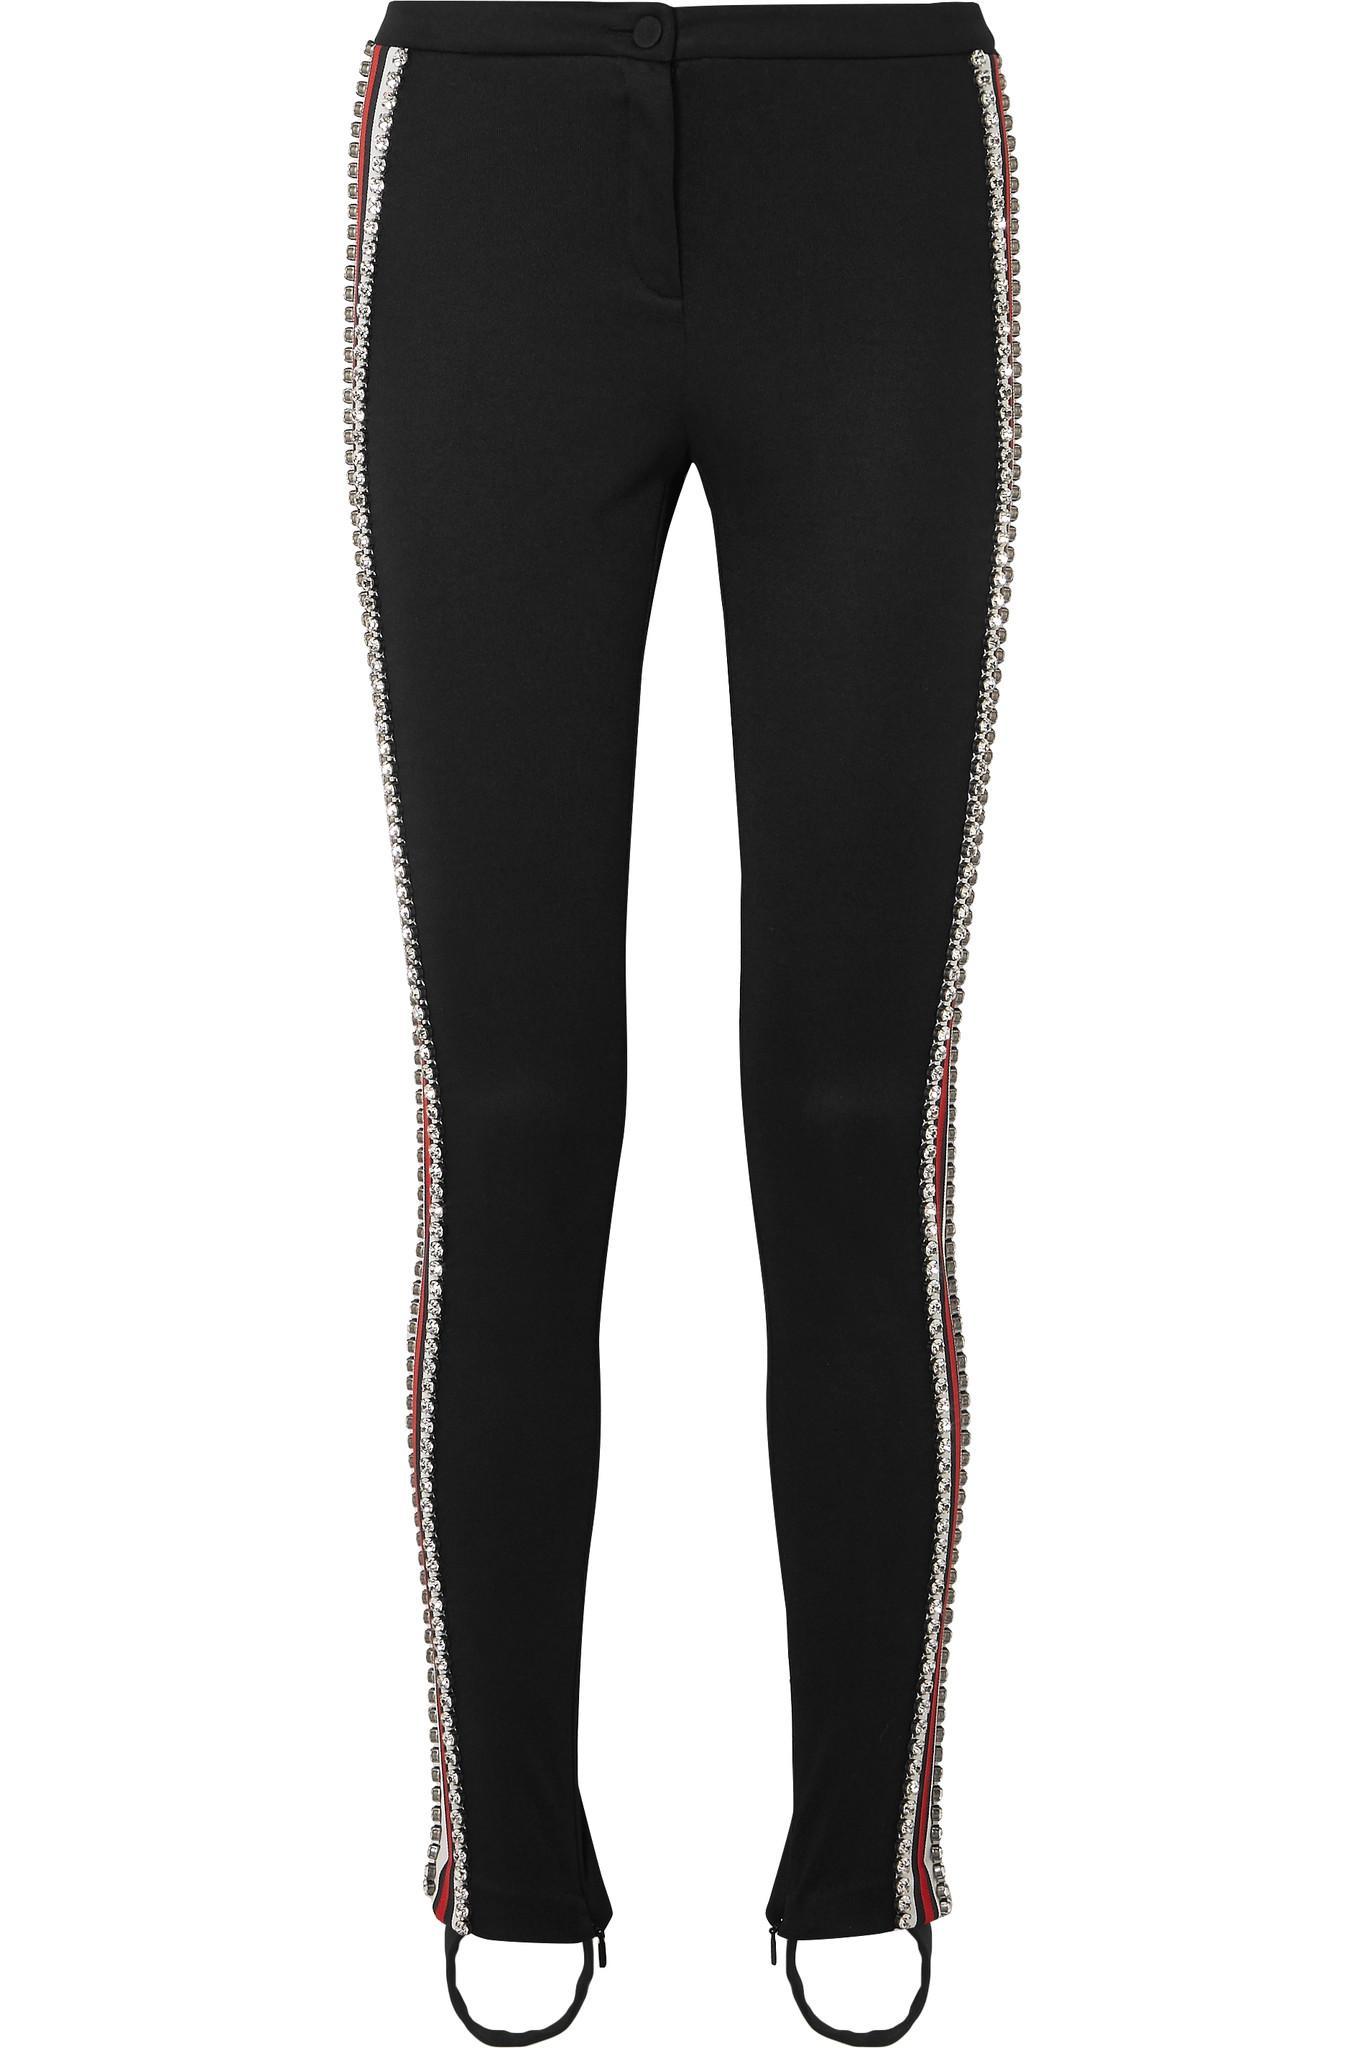 c67b4077f39 Gucci Striped Tech-jersey Leggings in Black - Save 63% - Lyst